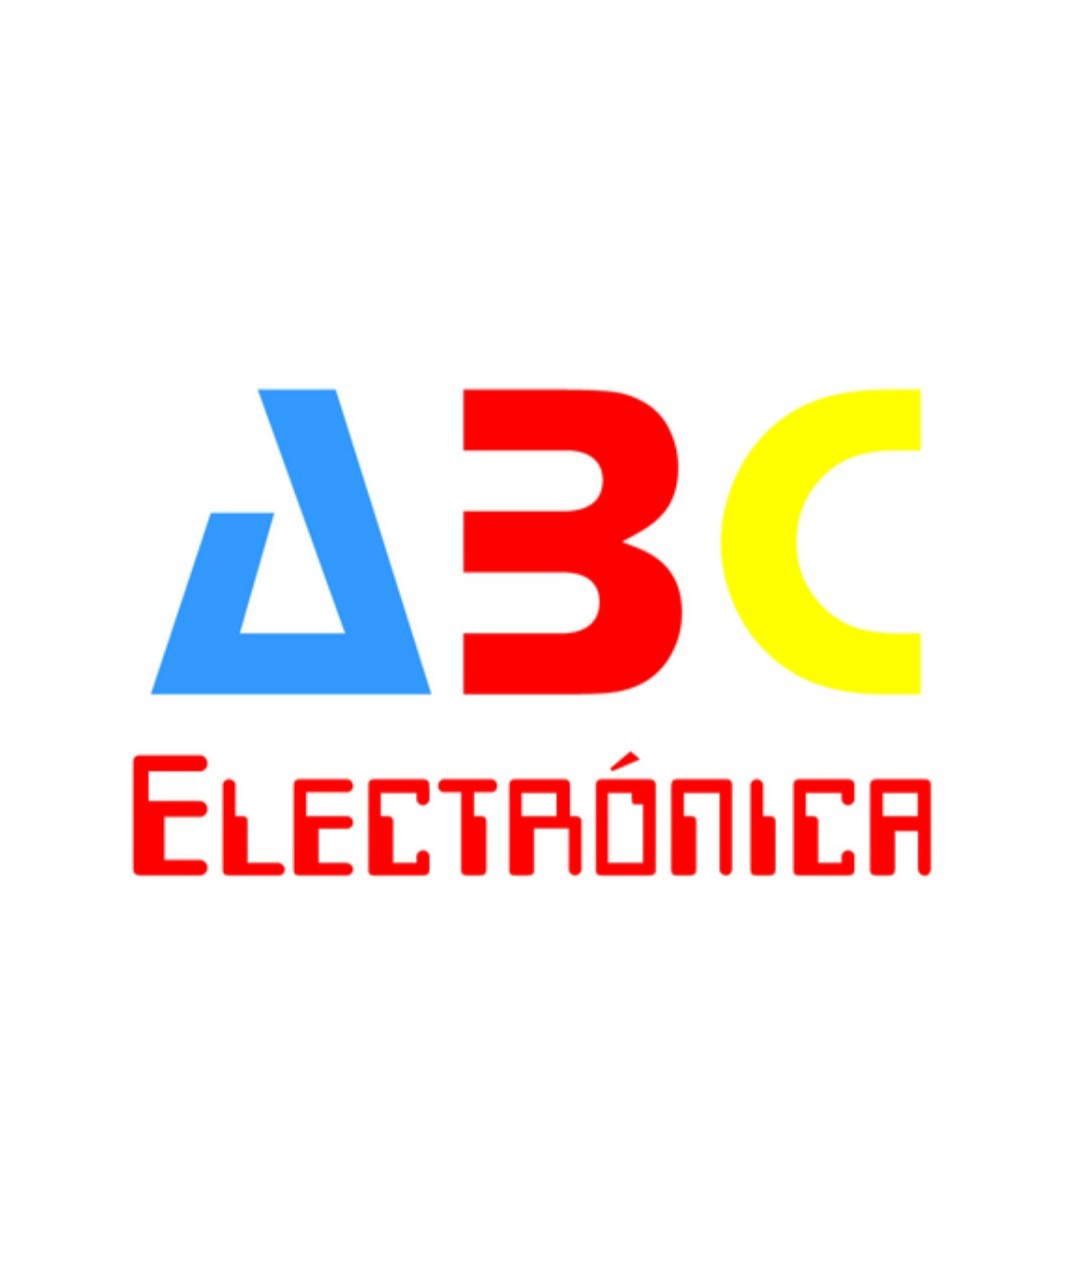 ABC Electronica